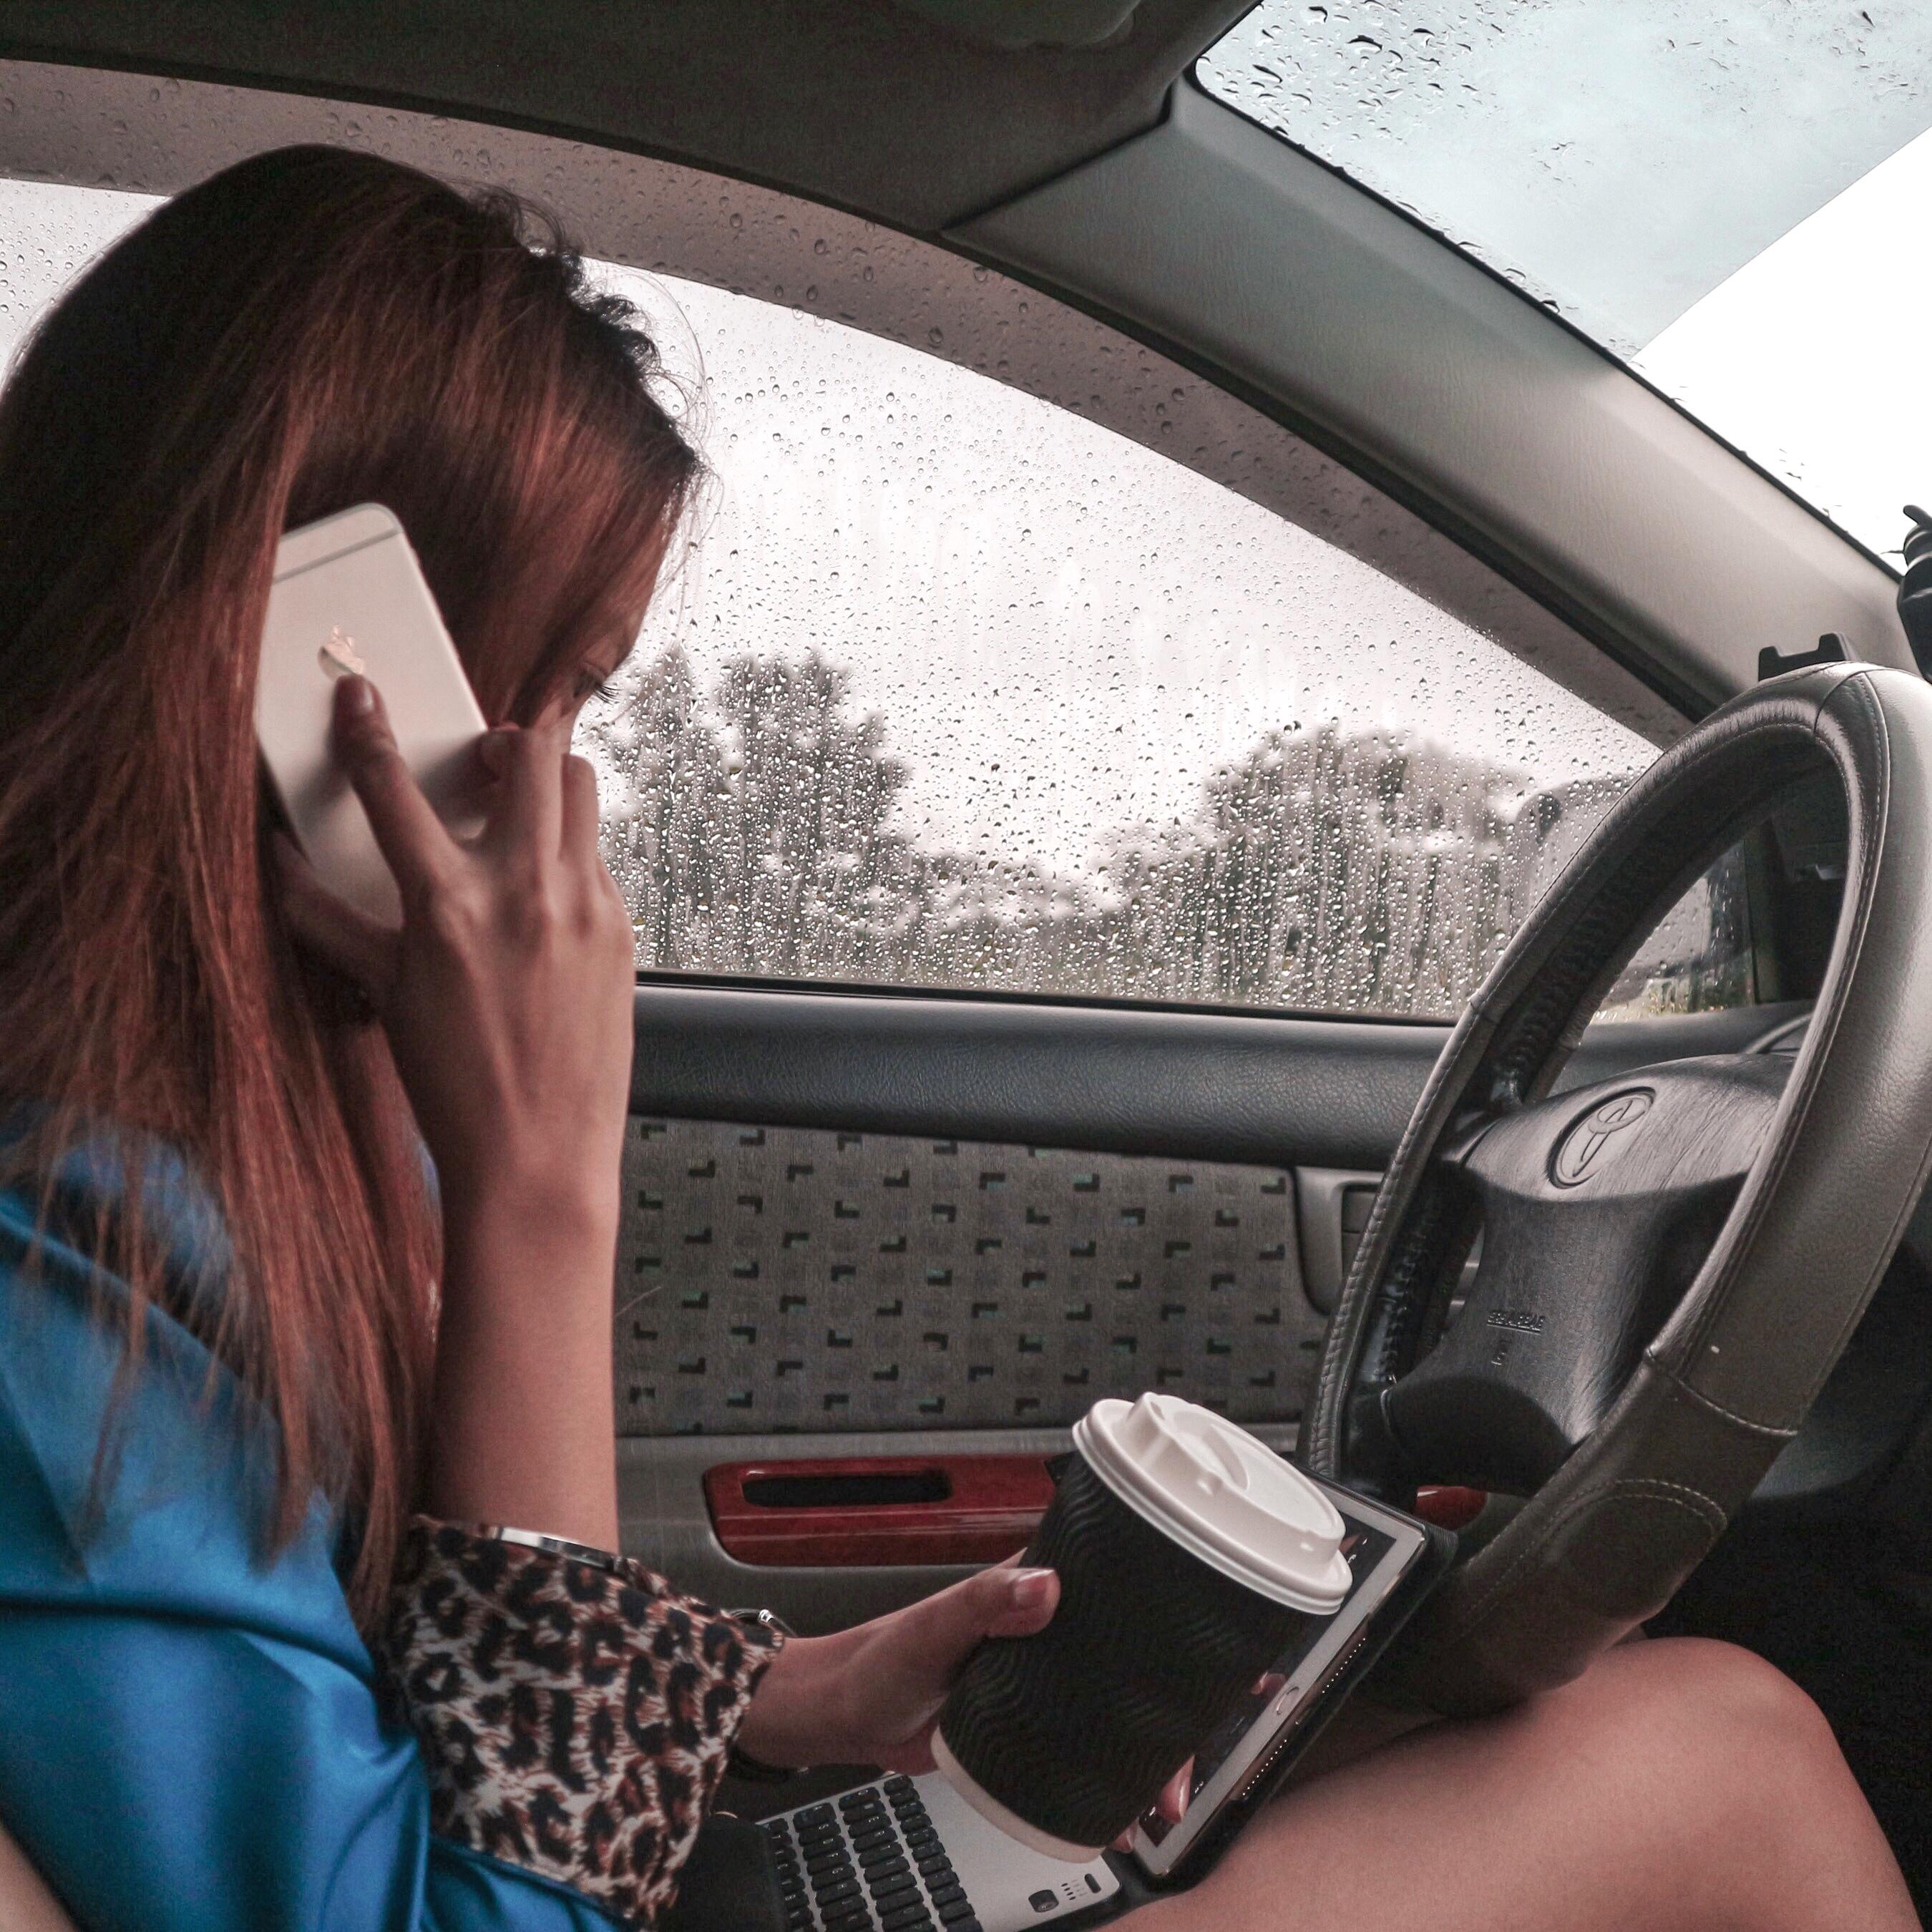 Digital Nomad in a car